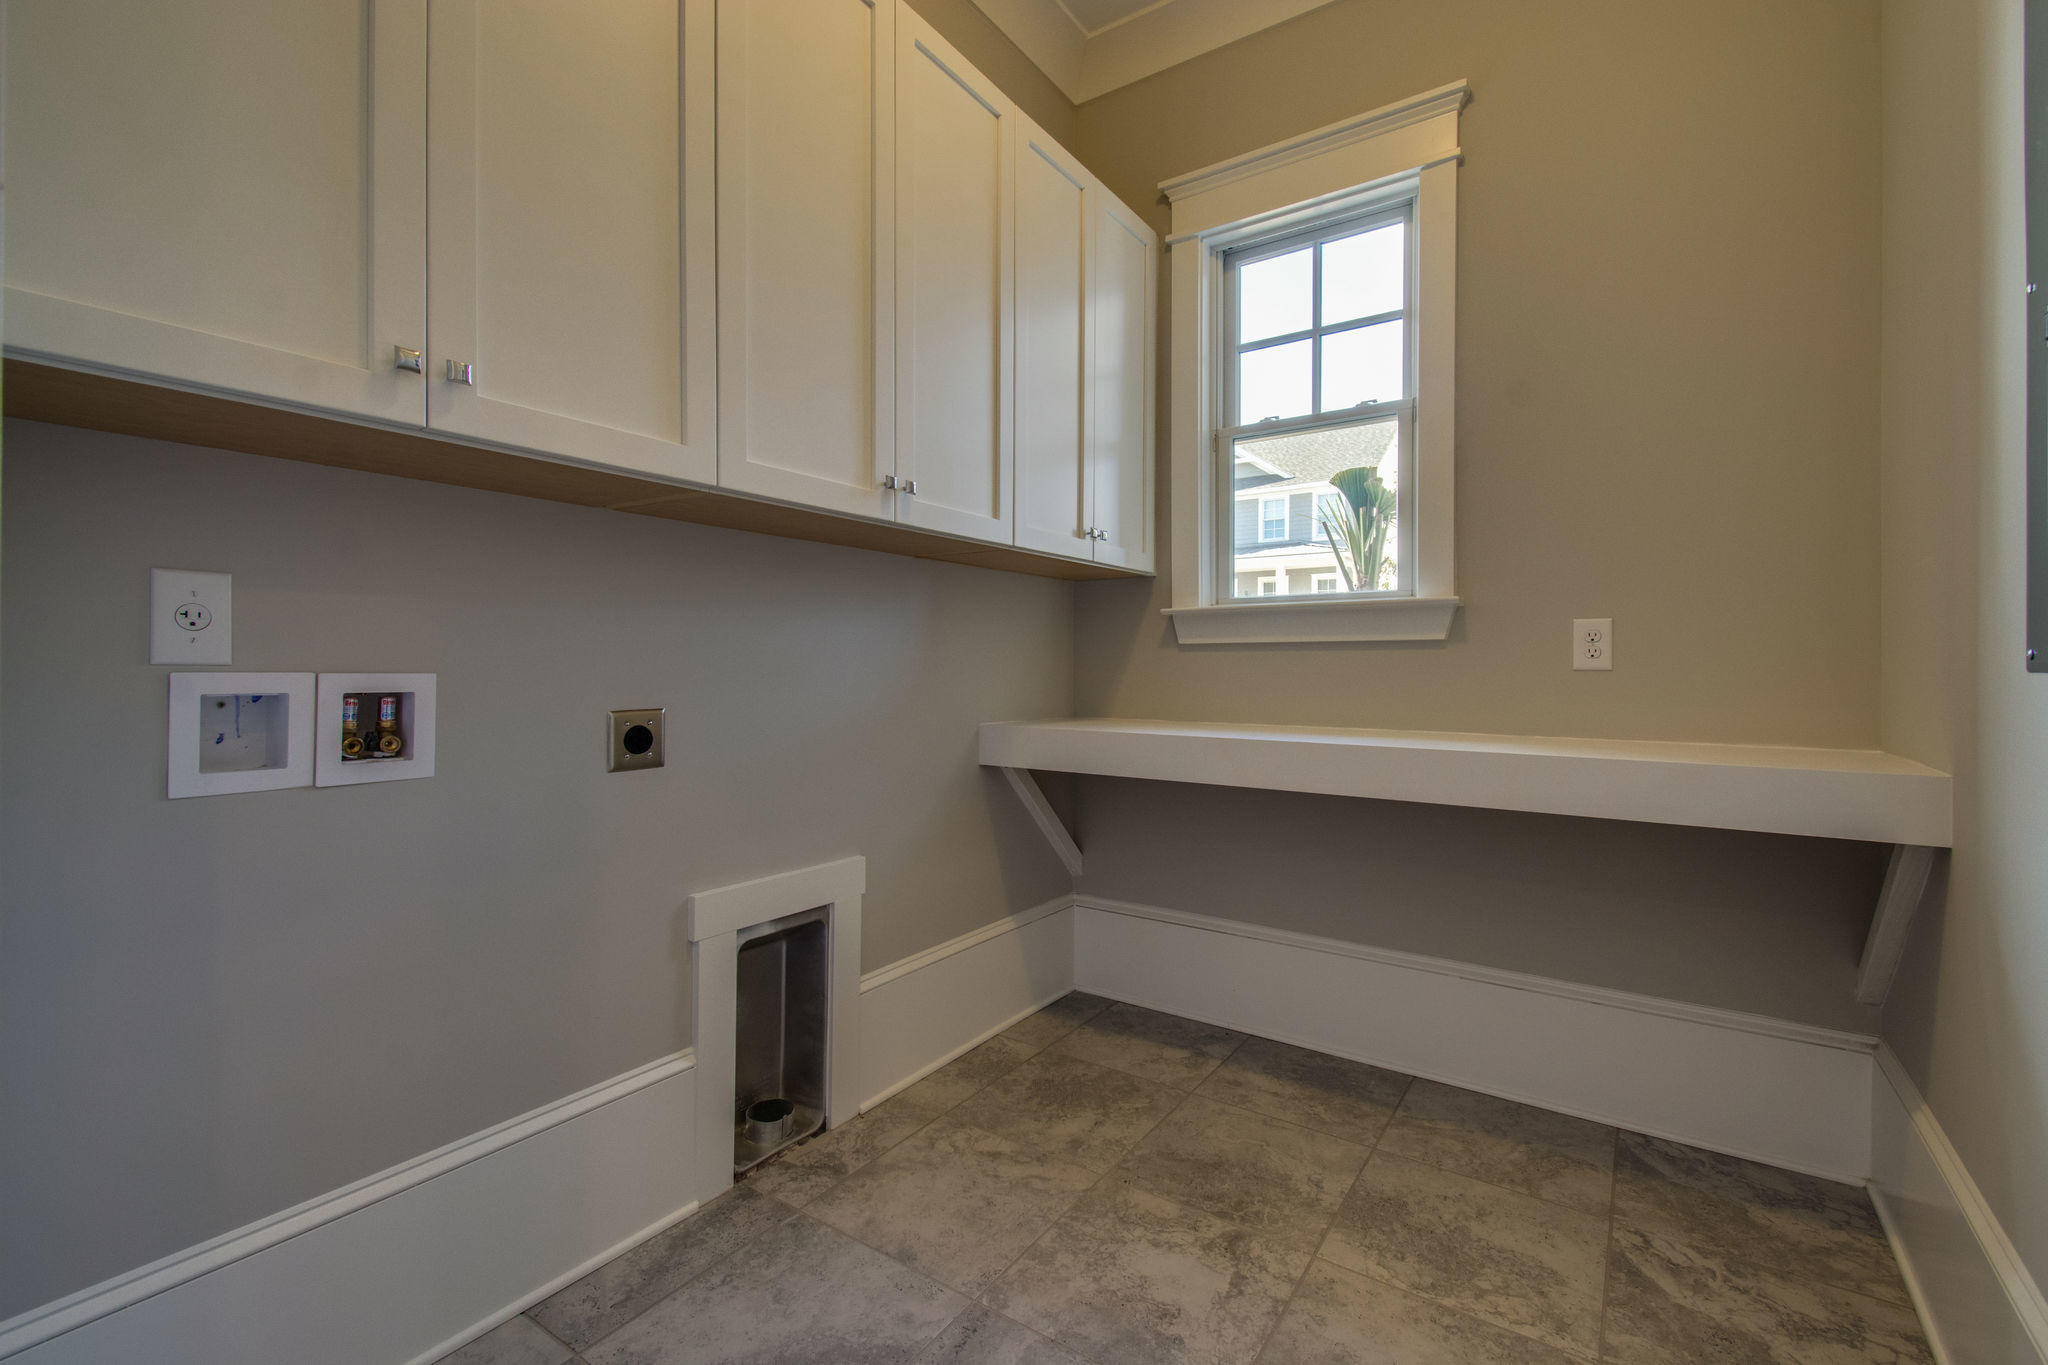 Daniel Island Park Homes For Sale - 112 Brailsford, Charleston, SC - 37